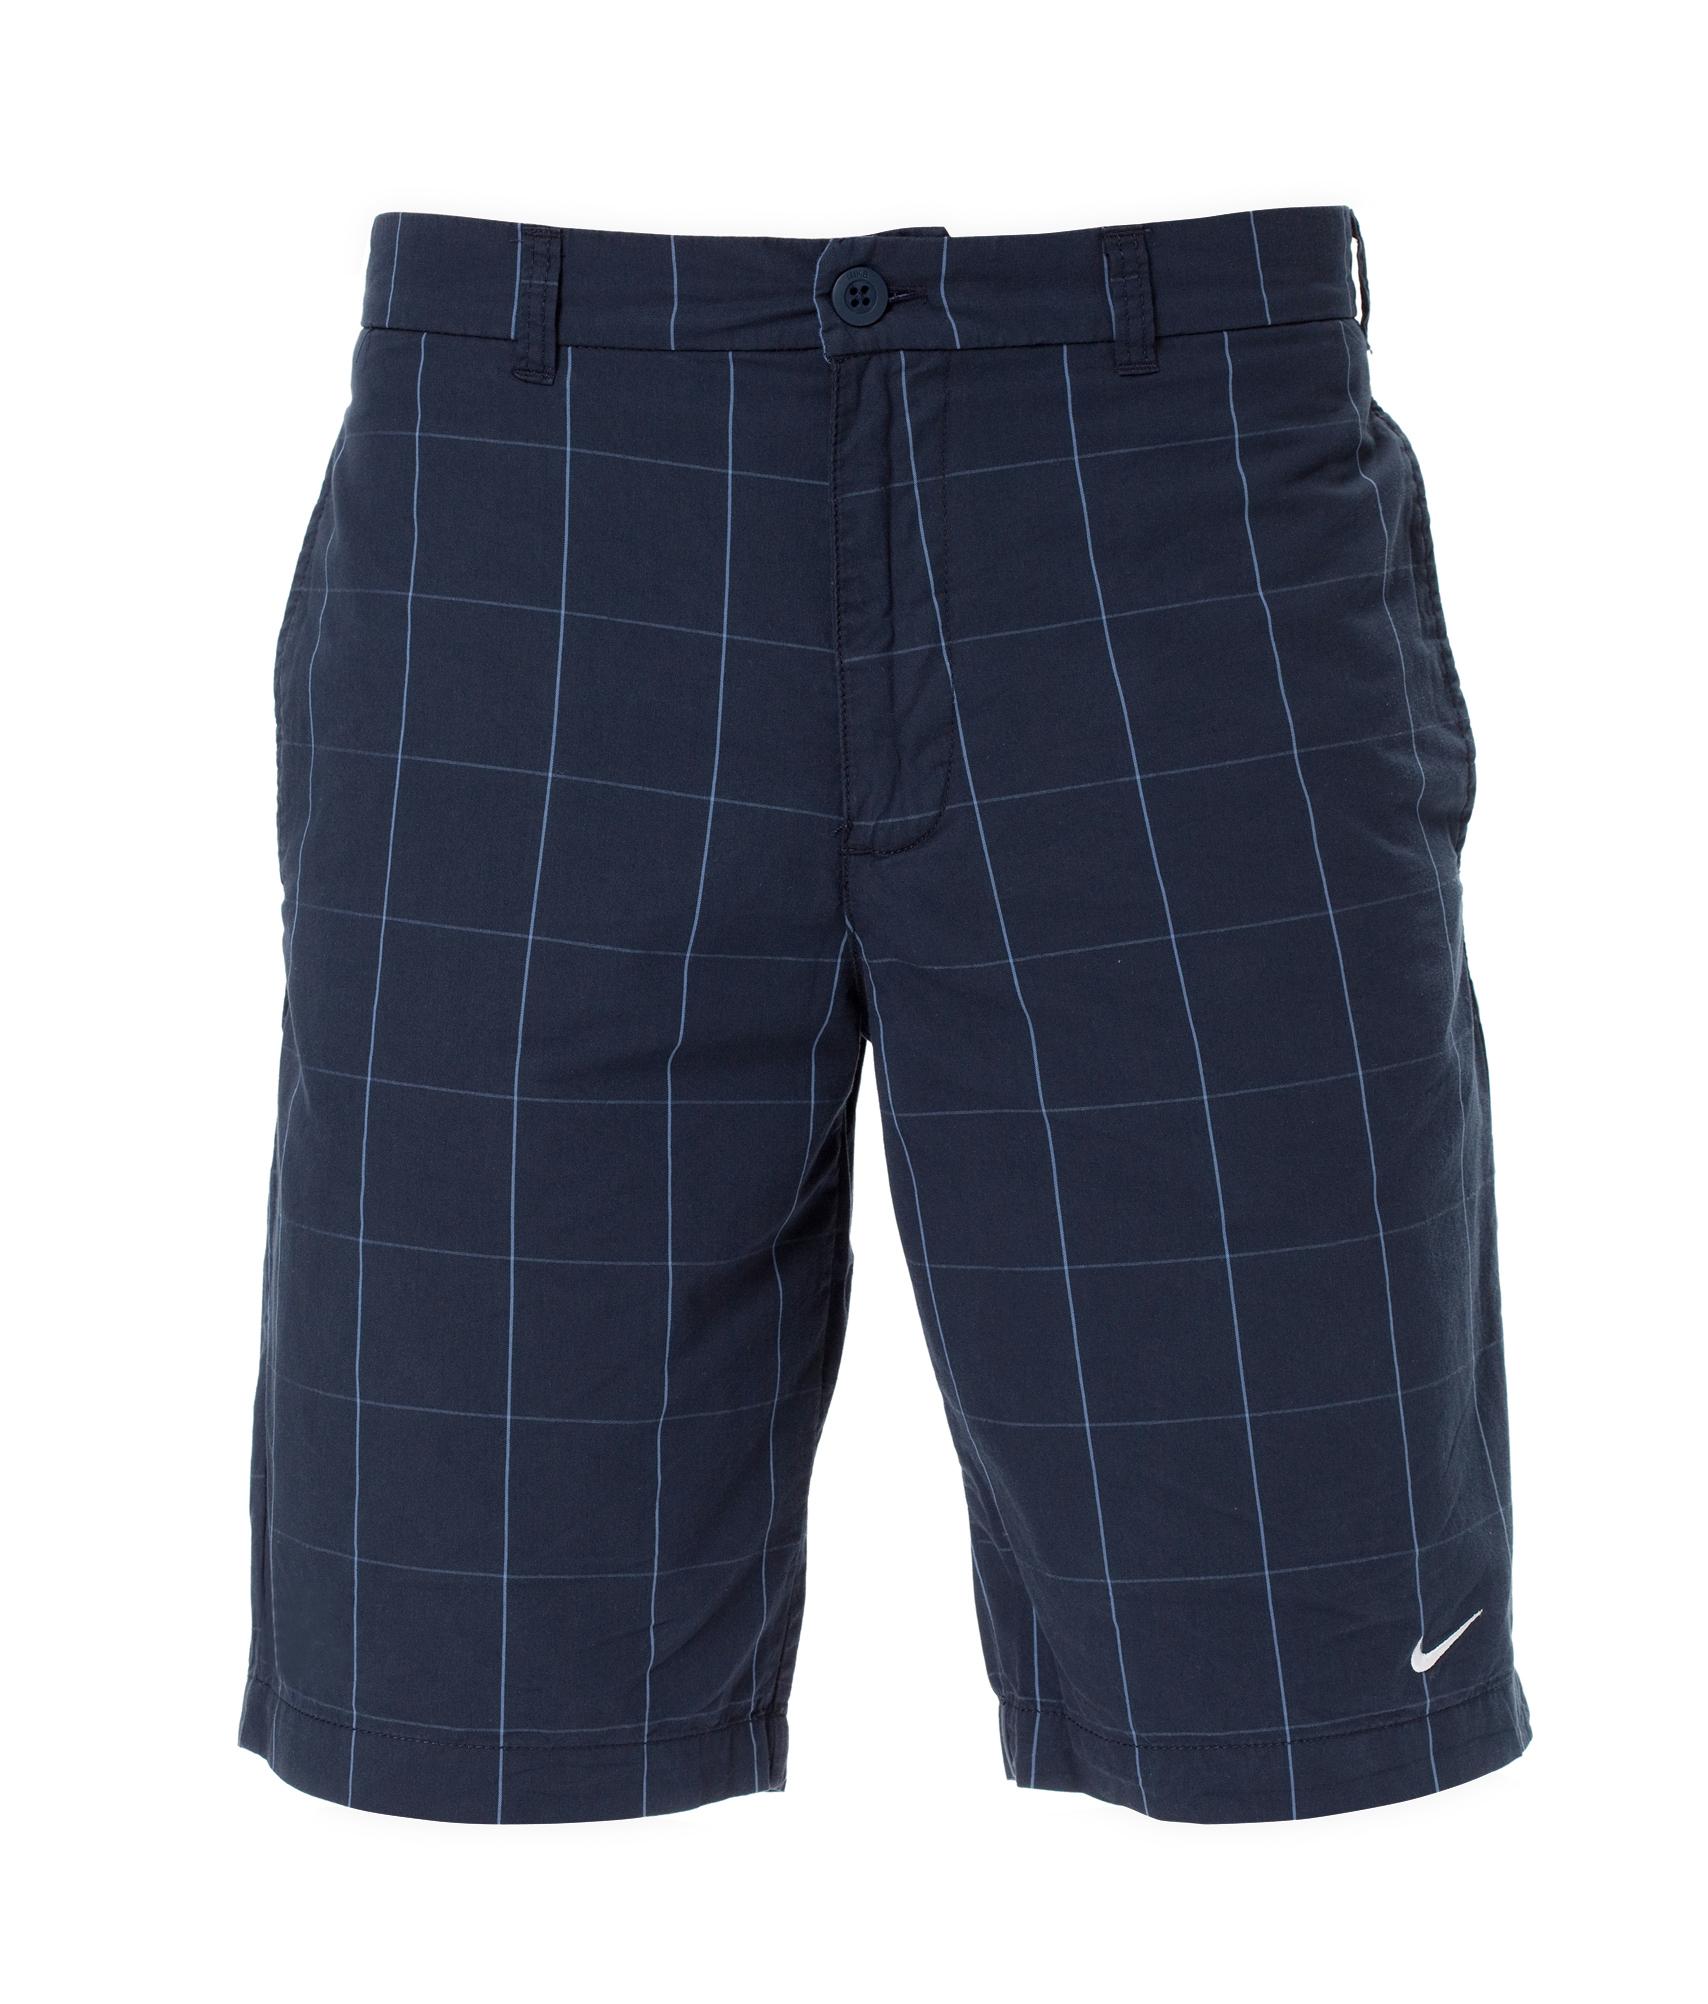 Шорты Nike Sideline Plaid Woven Short, Цвет-Черно-Синий, Размер-M